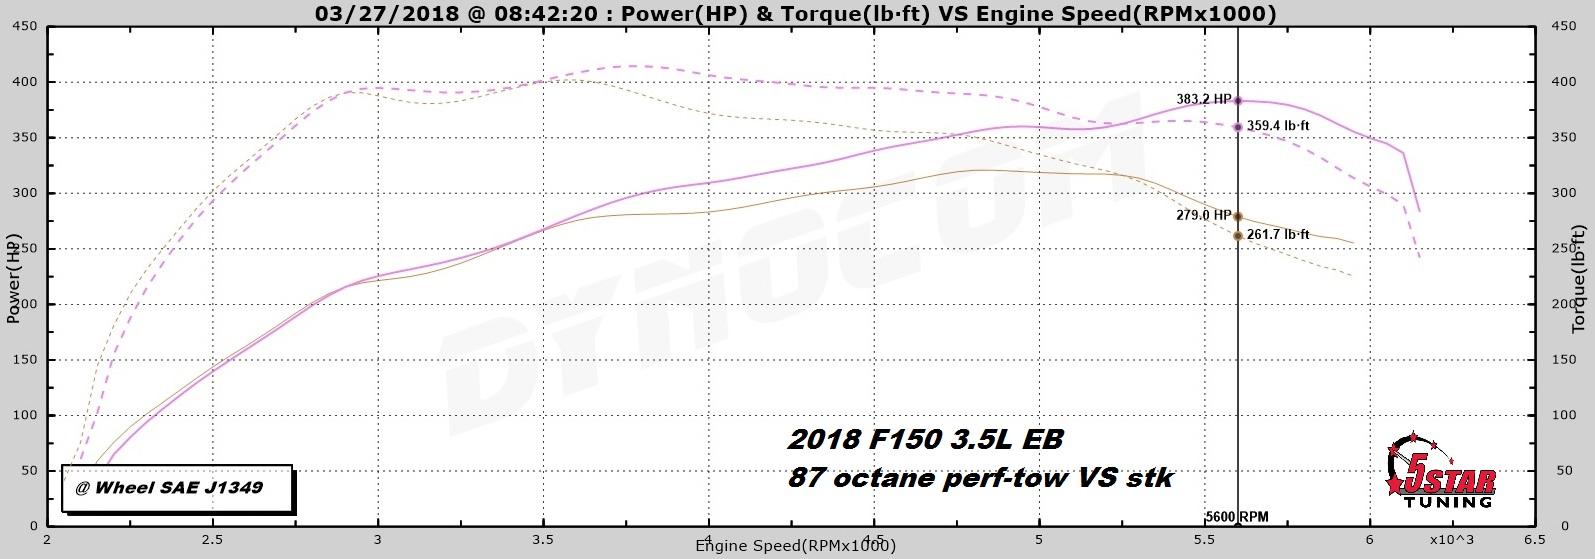 87 perf-tow vs stk hp